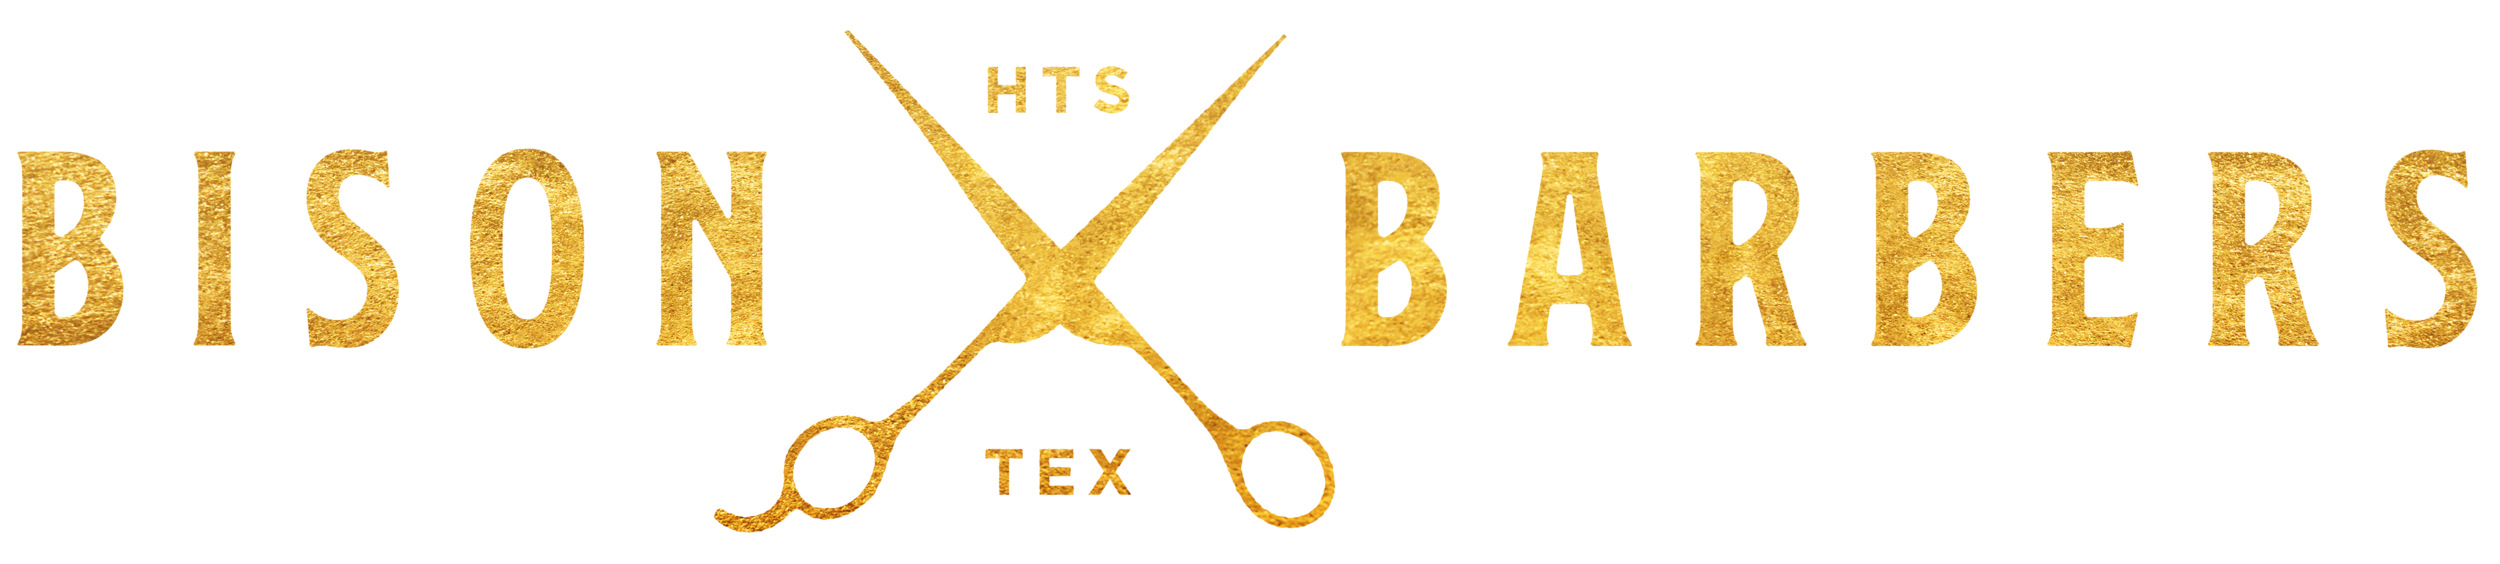 BB_logo_shears_UPDATE.png